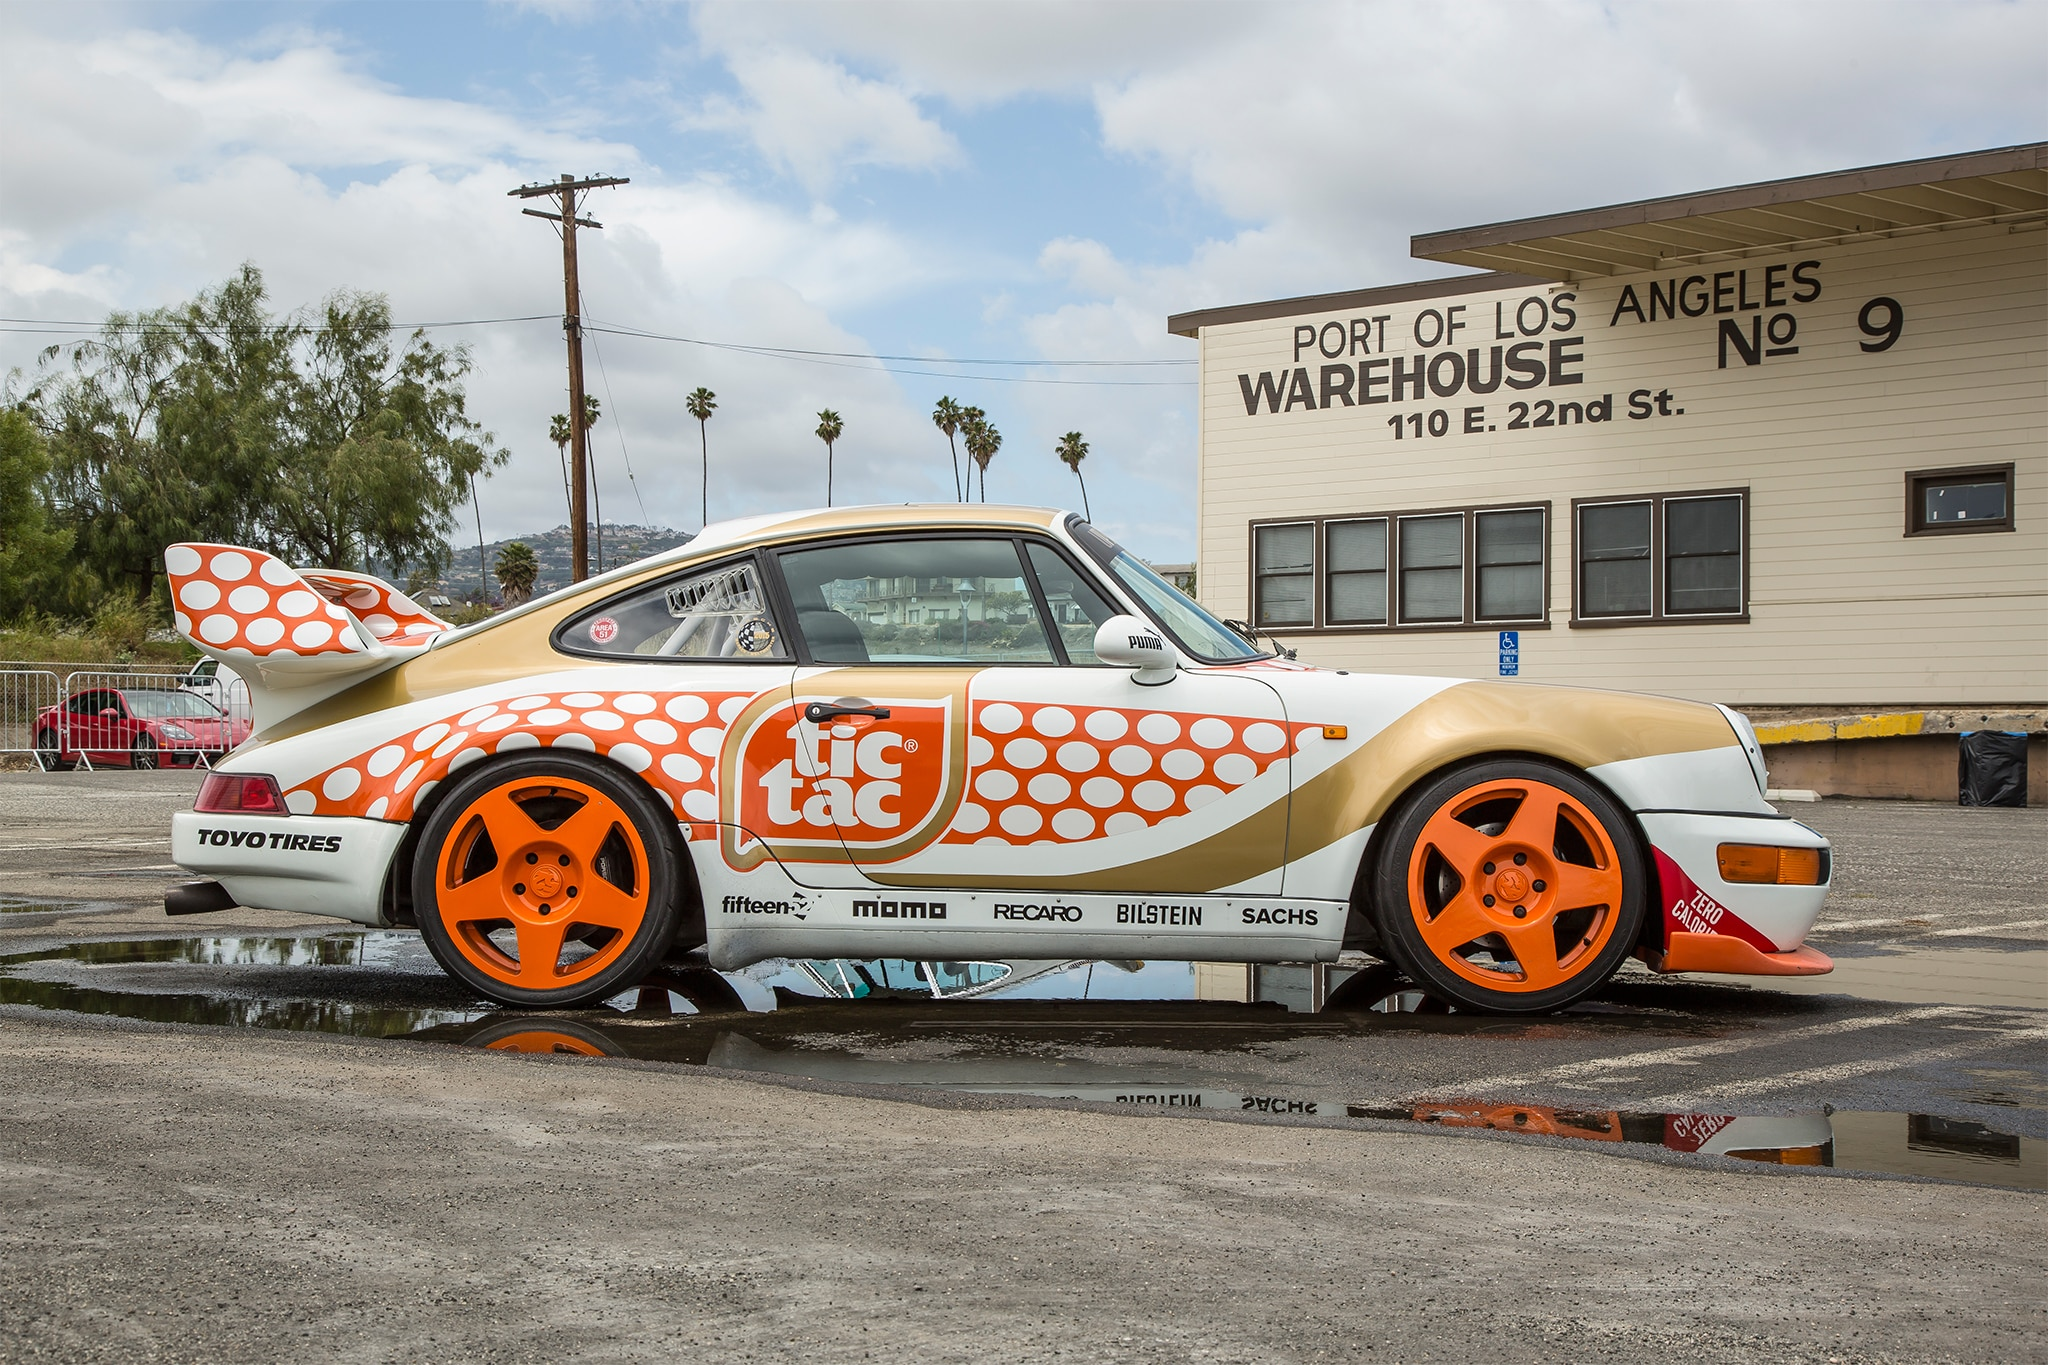 Luftgekuhlt Air Cooled Porsches In Los Angeles 101